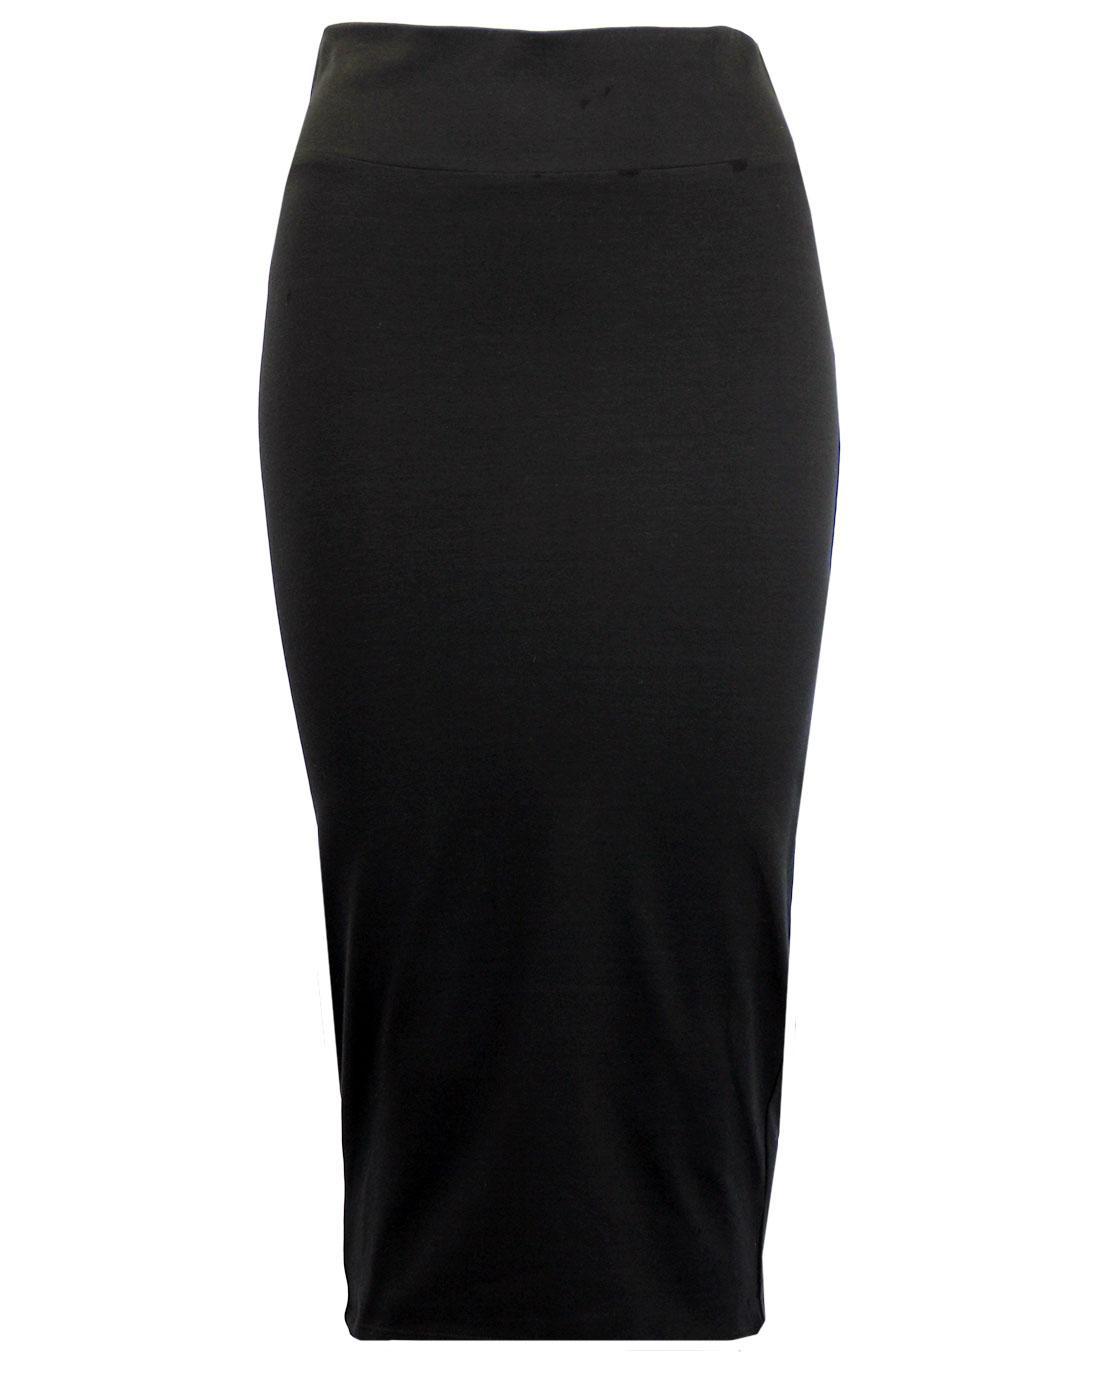 eUKalyptus Retro 1950s Style Pencil Skirt in Black